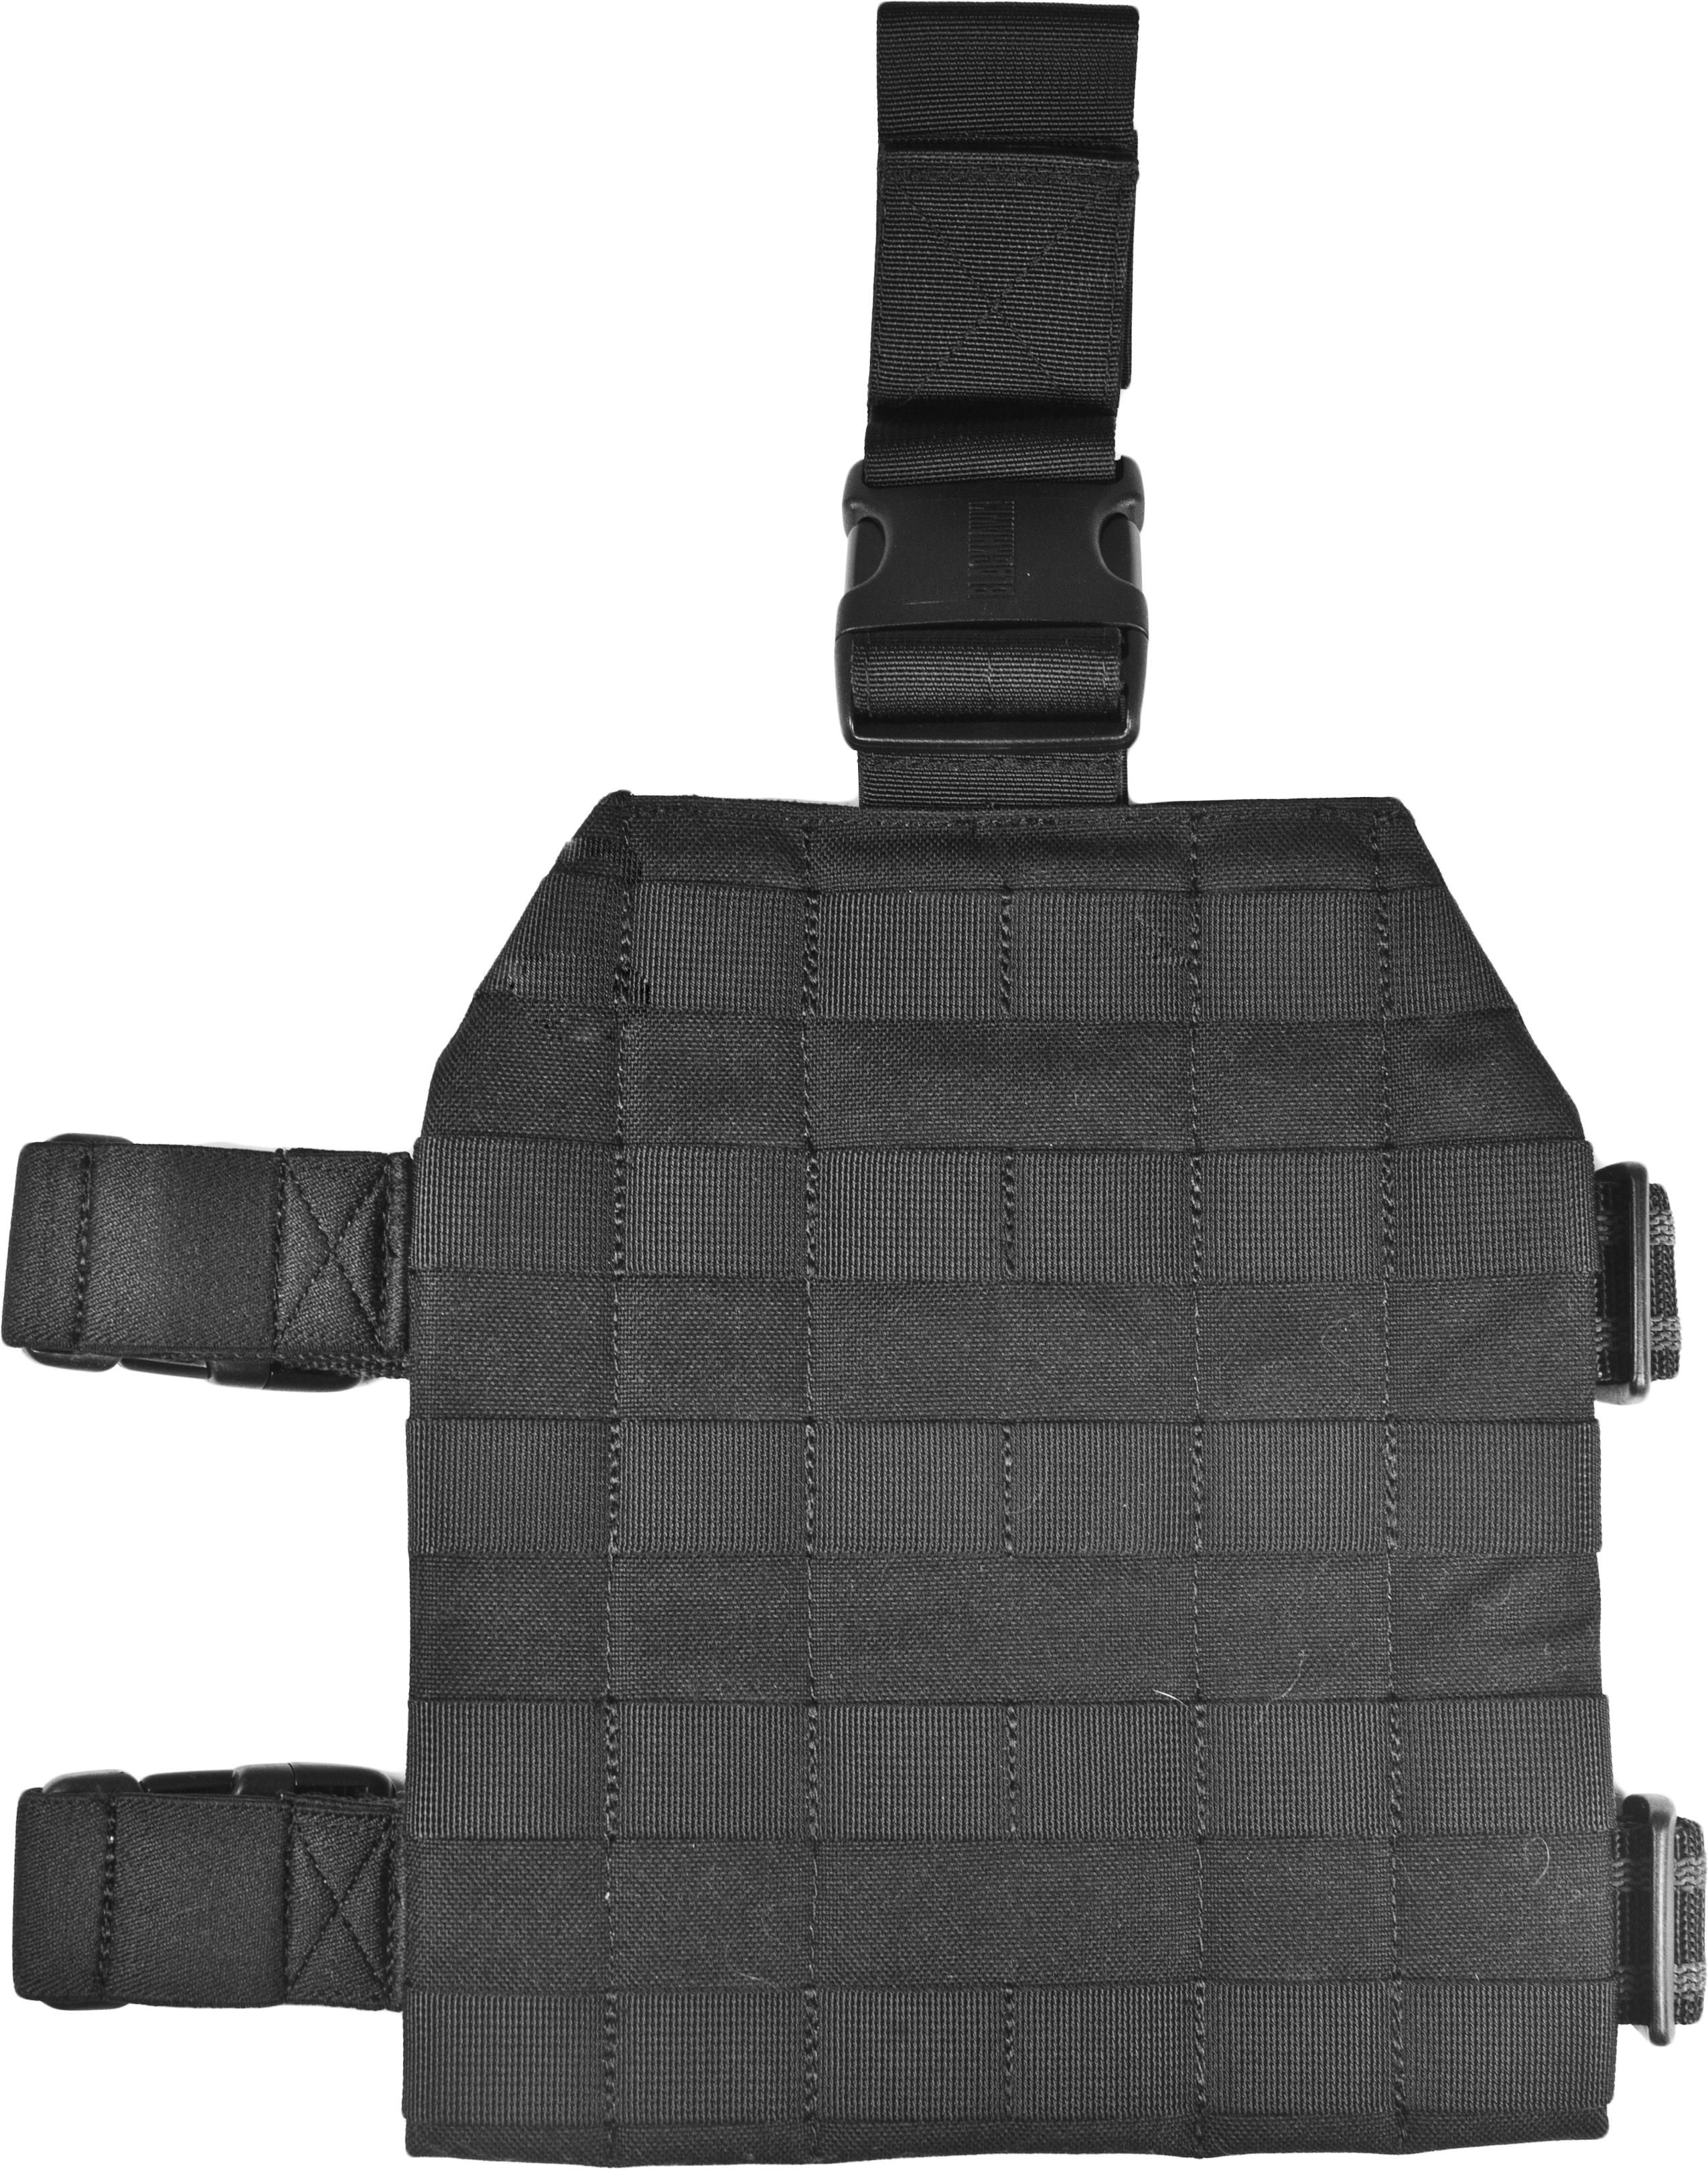 BlackHawk S.T.R.I.K.E. Gen-4 MOLLE System Drop Leg Platform  f714a0b27e